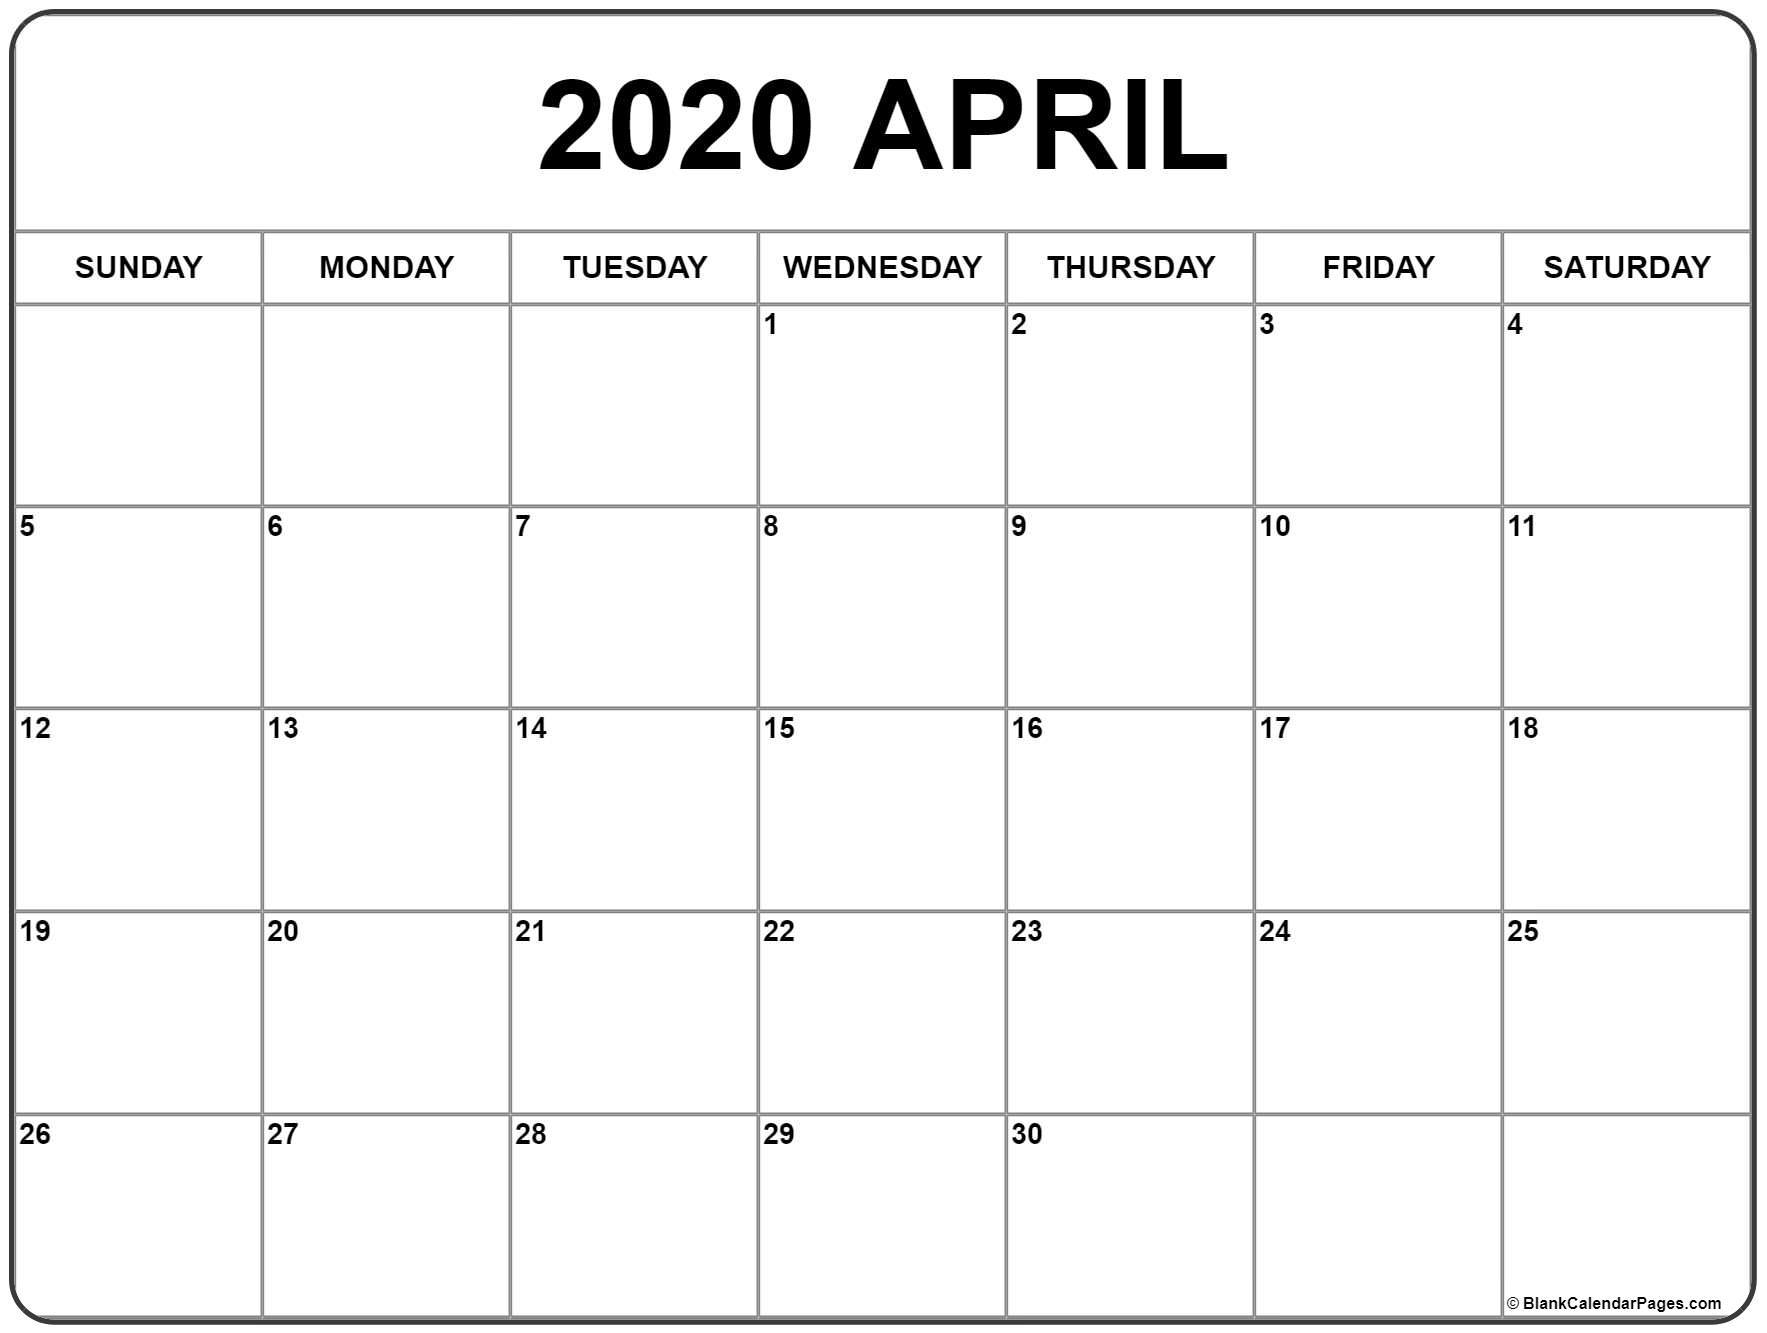 April 2020 Calendar Easter